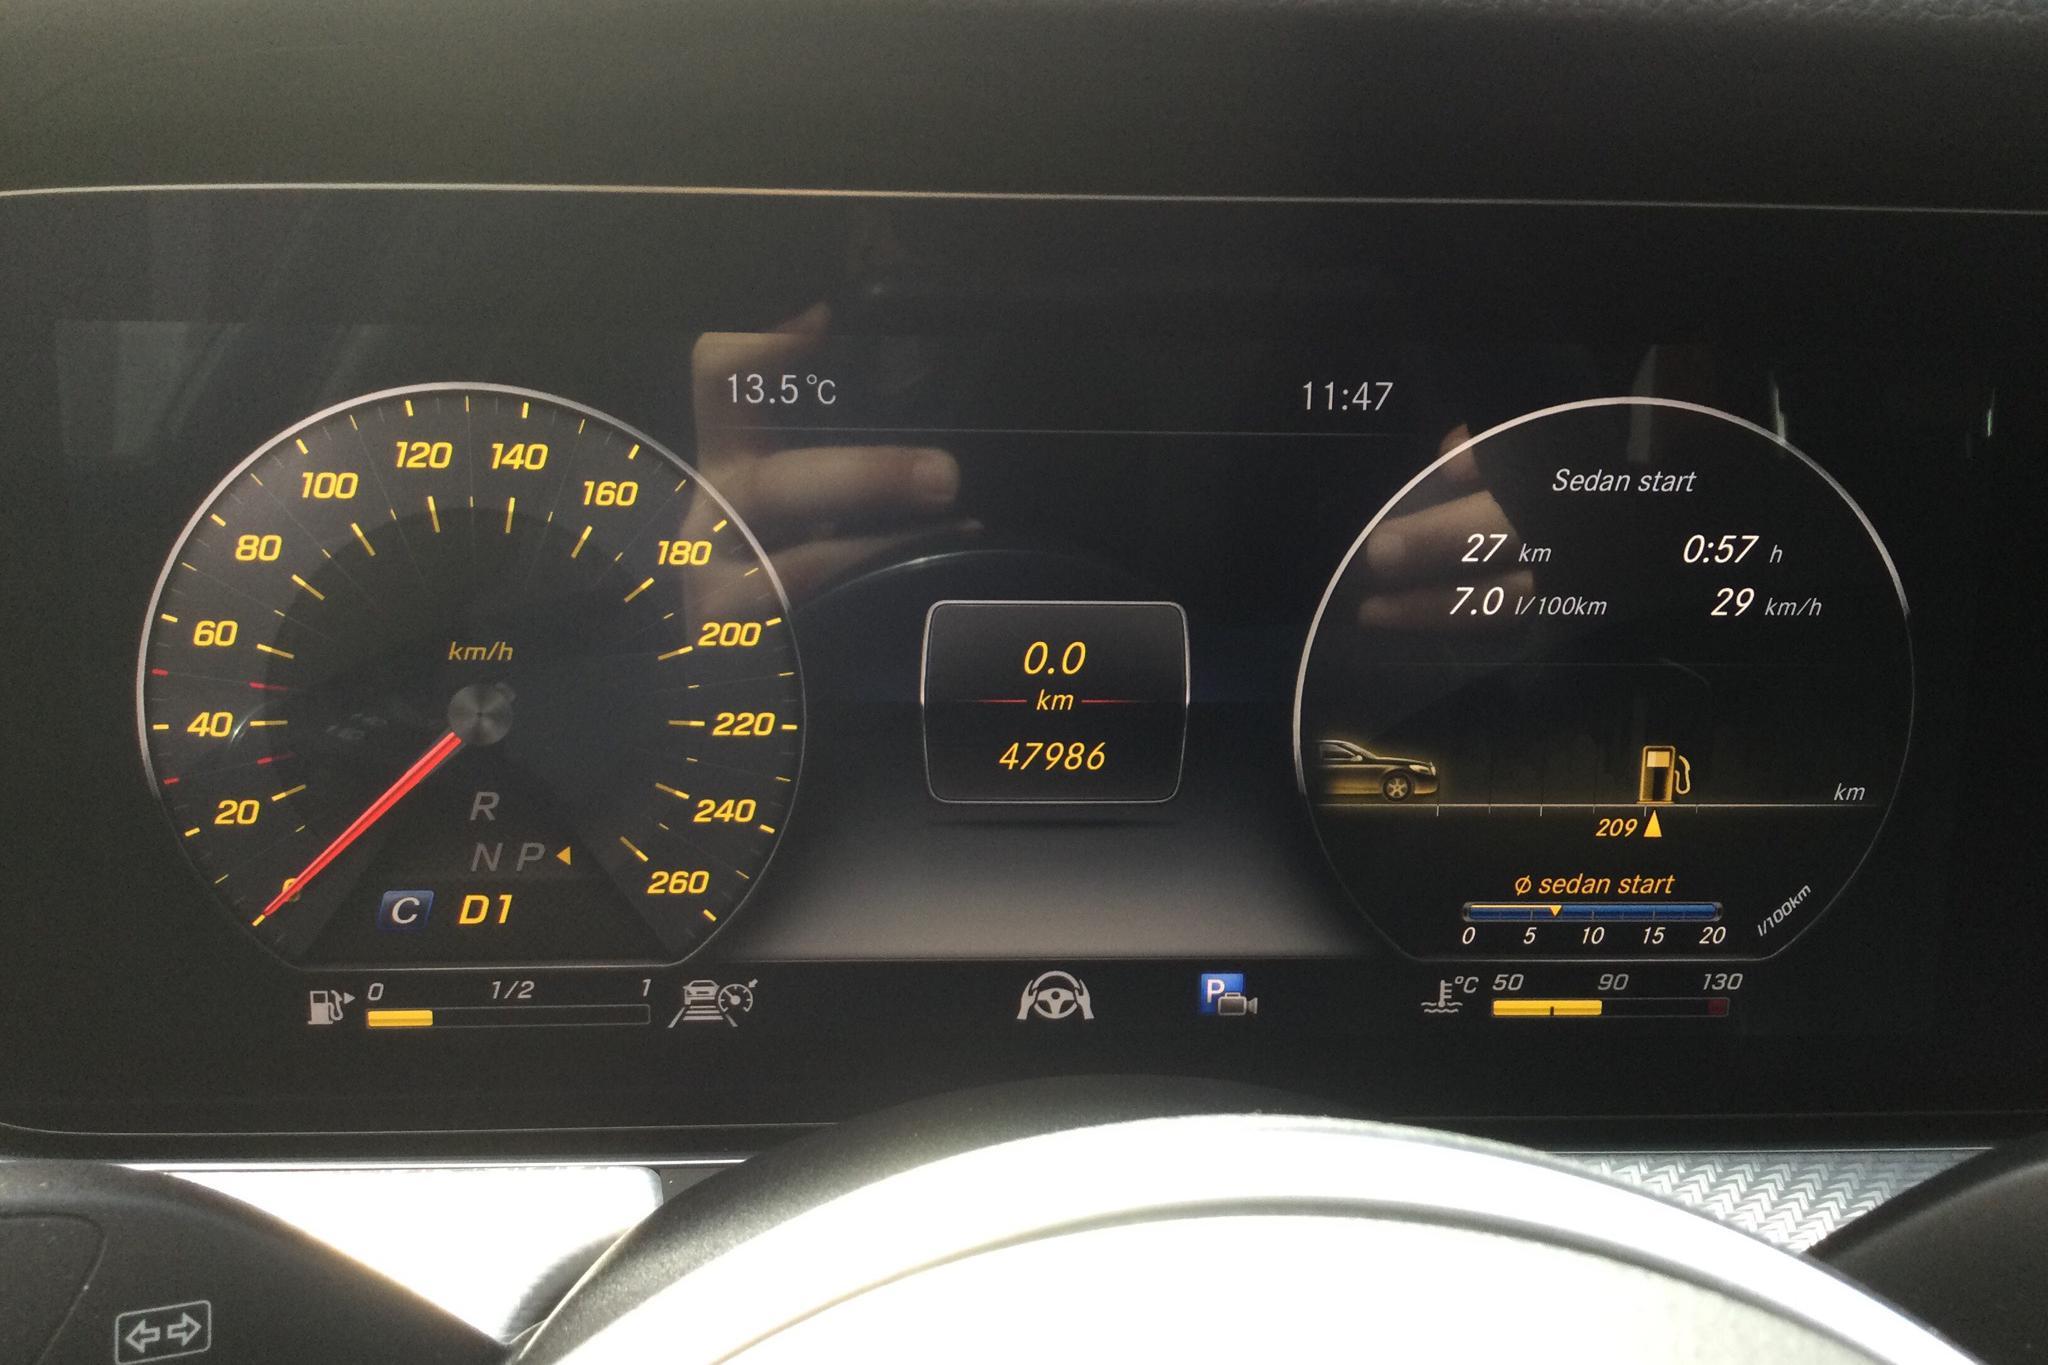 Mercedes E 220 d 4MATIC Kombi All-Terrain S213 (194hk) - 4 798 mil - Automat - grå - 2019